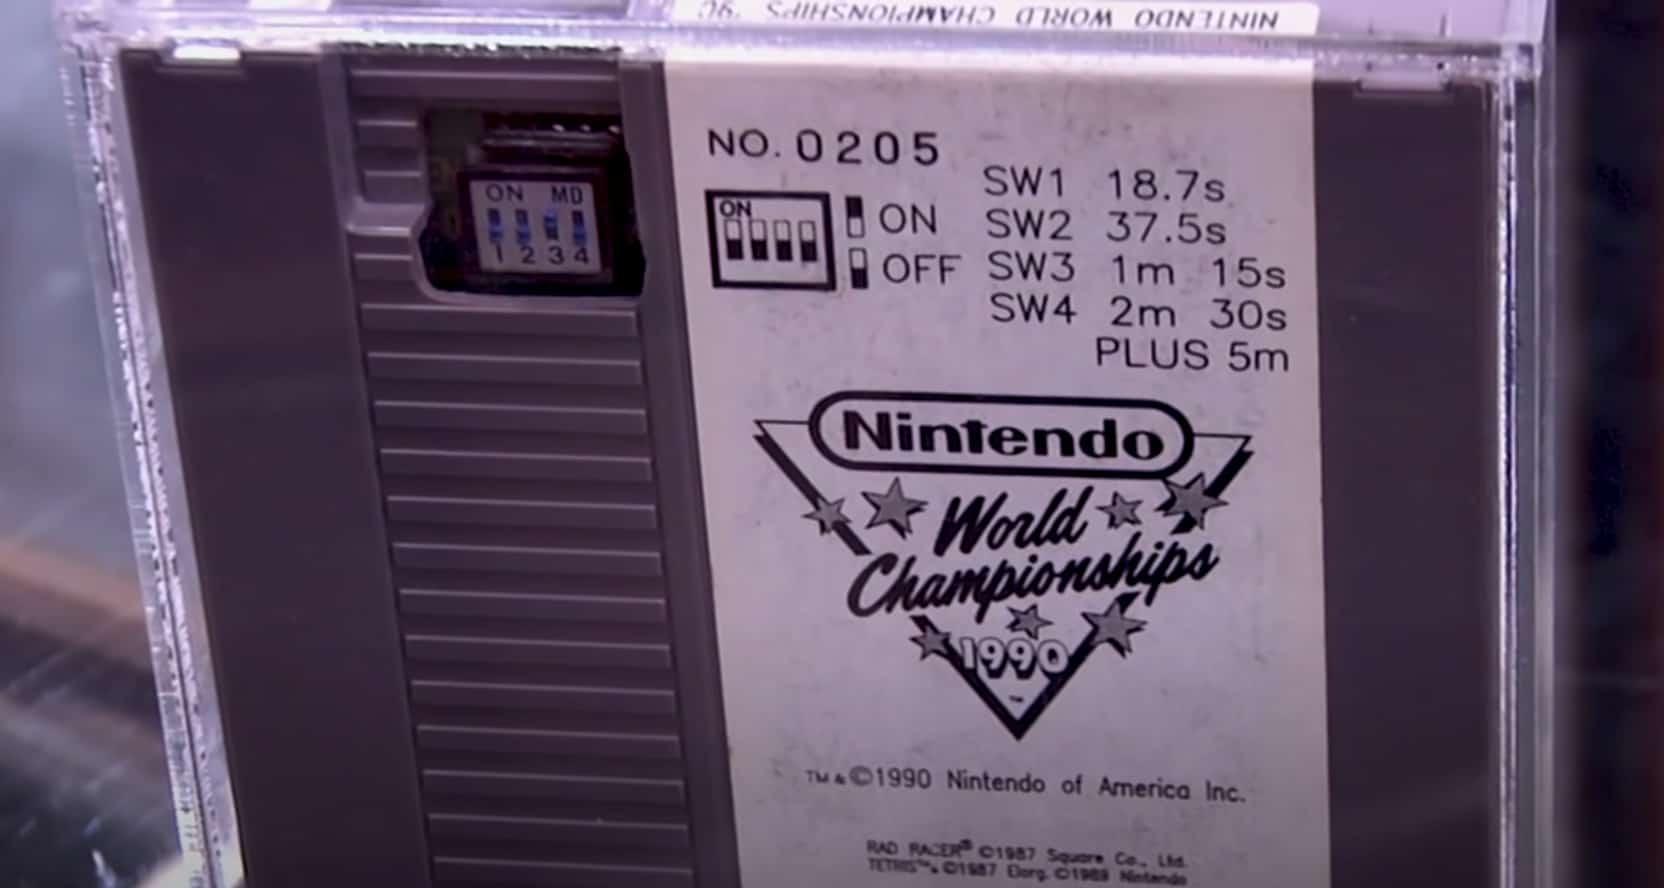 Nintendo World Championship Grey Cartridge Switches